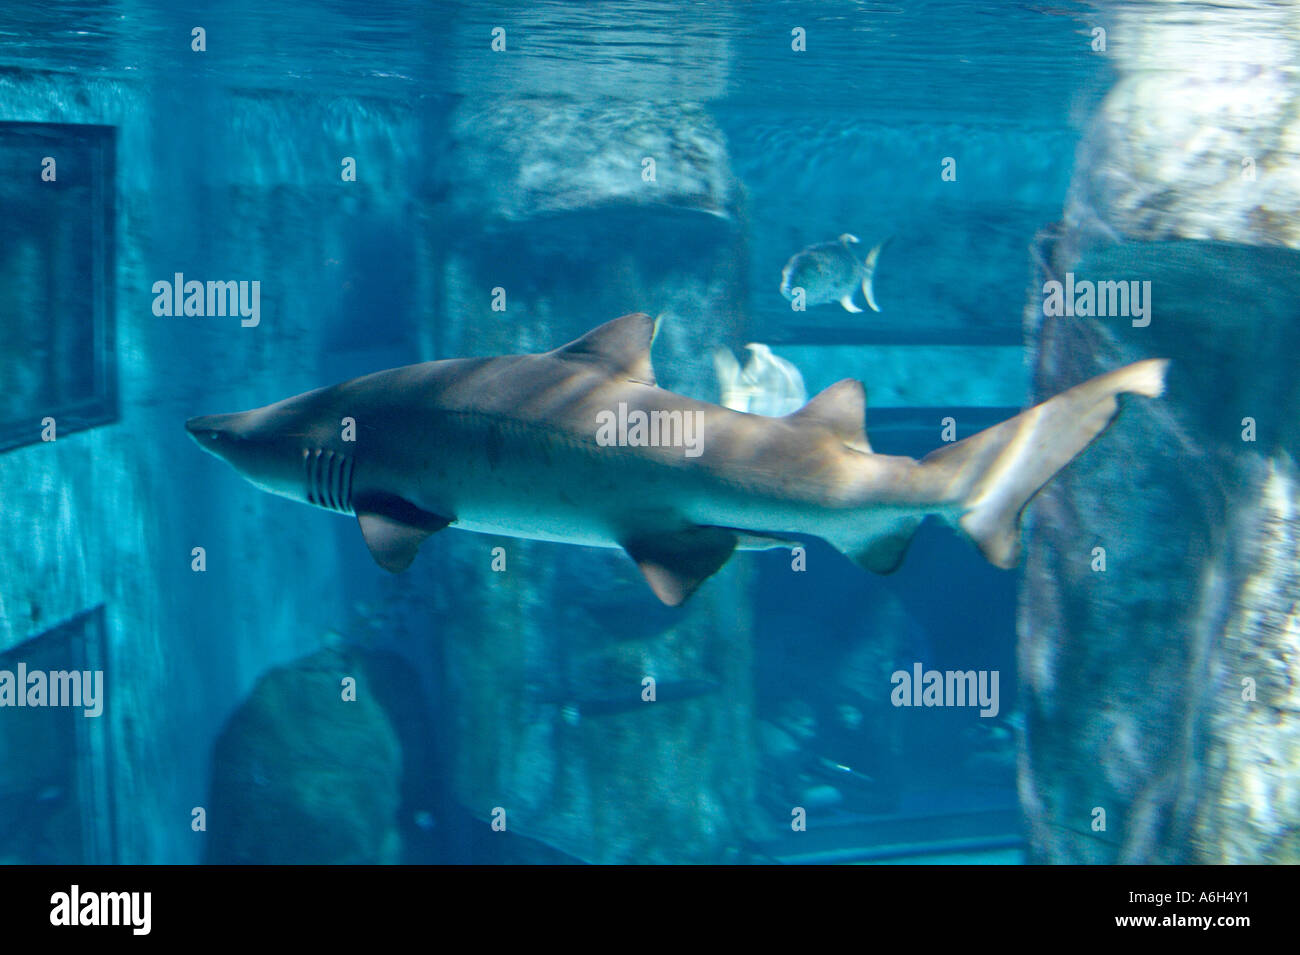 Buy fish for aquarium london - Sand Tiger Shark Odontaspis Taurus Fish Swimming In Tank In London Aquarium London Se1 England Uk